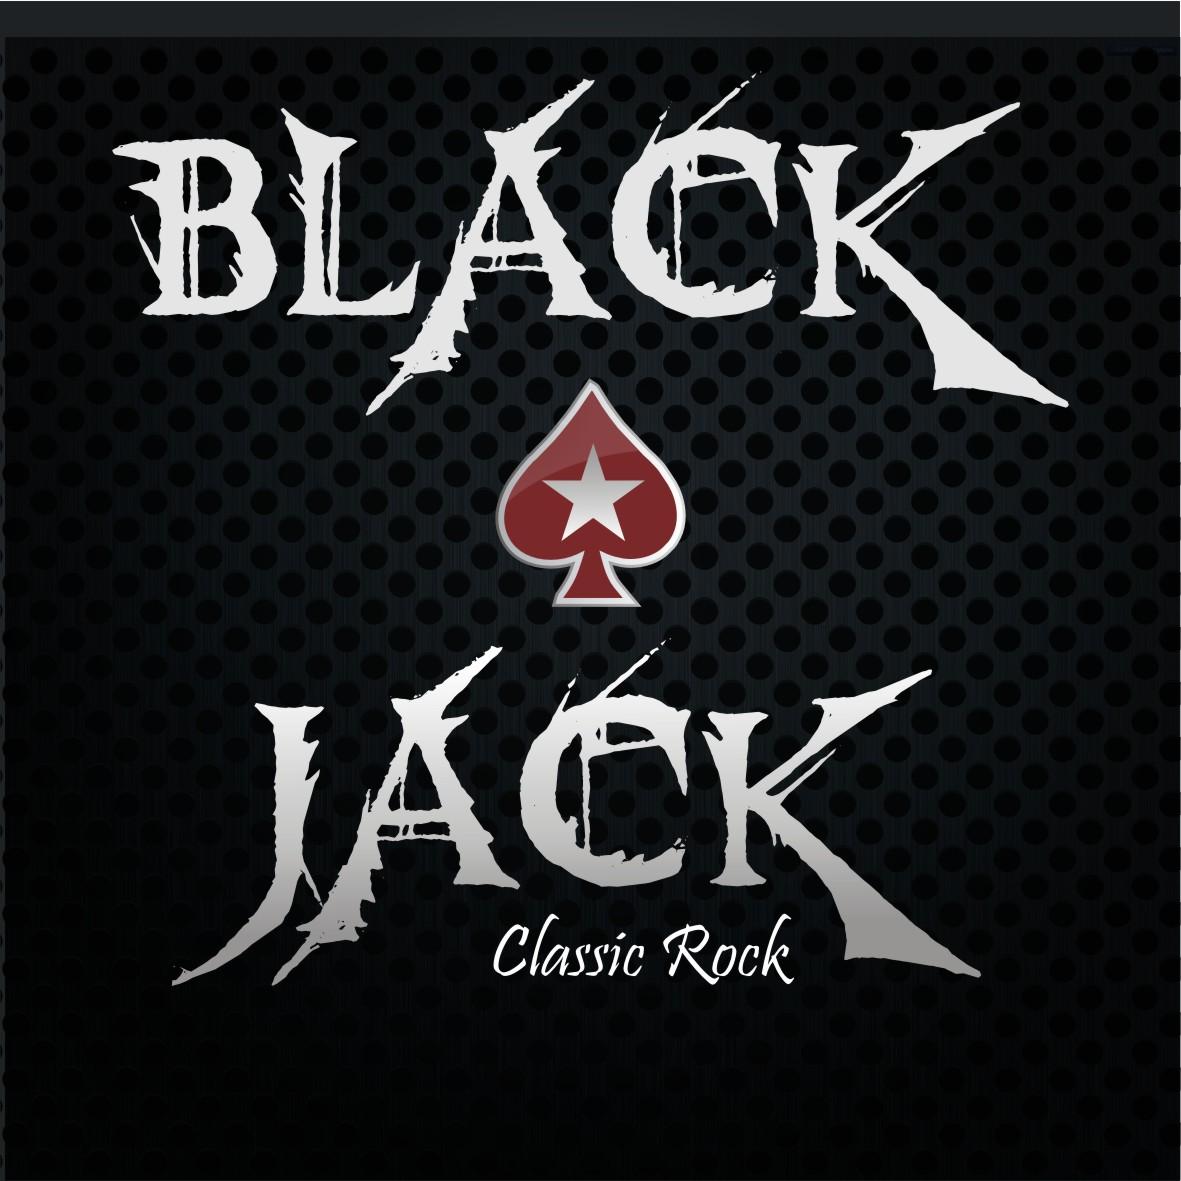 Blackjack ac dc